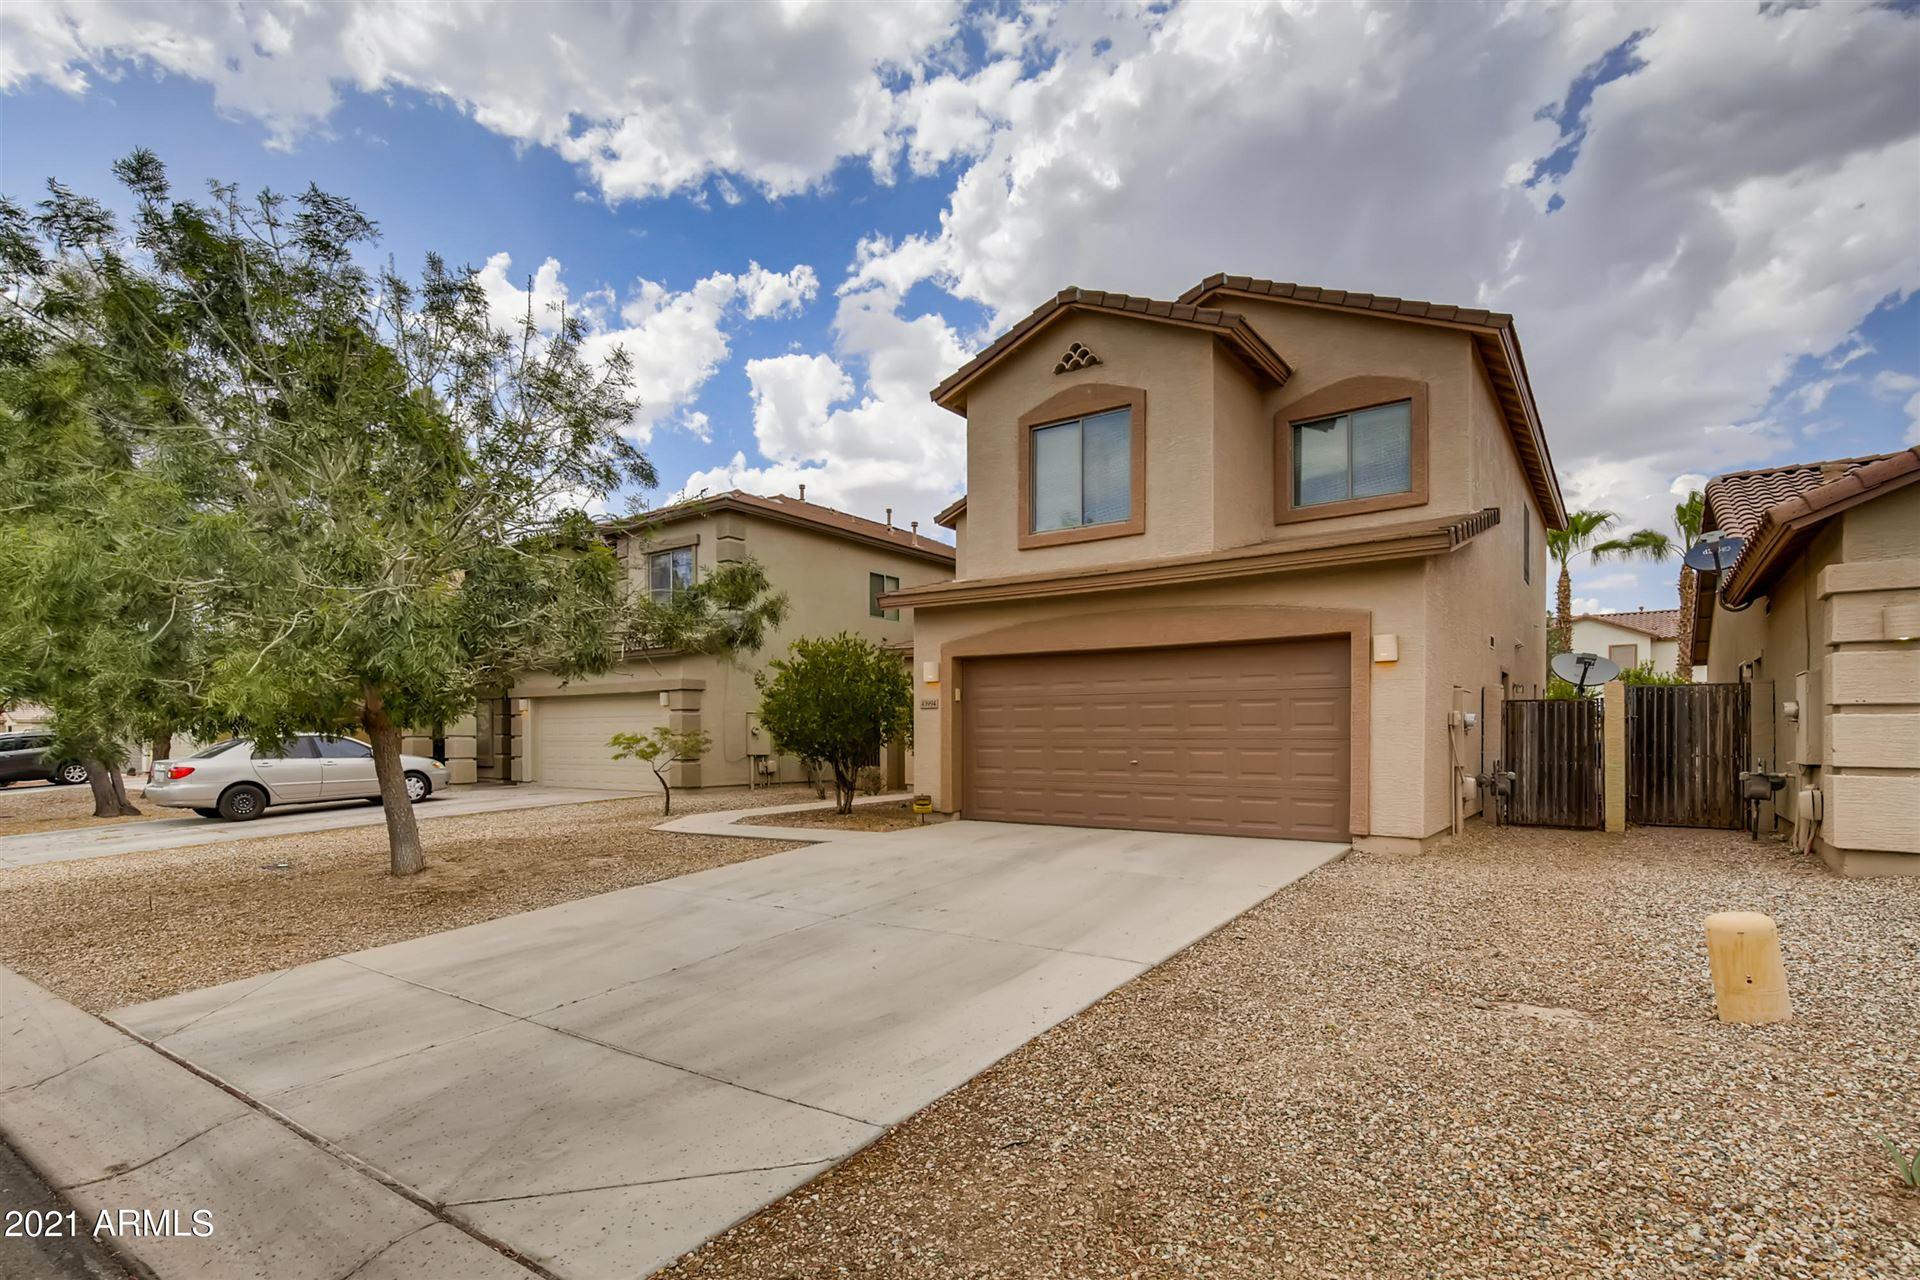 Photo for 43994 W CYPRESS Lane, Maricopa, AZ 85138 (MLS # 6256263)